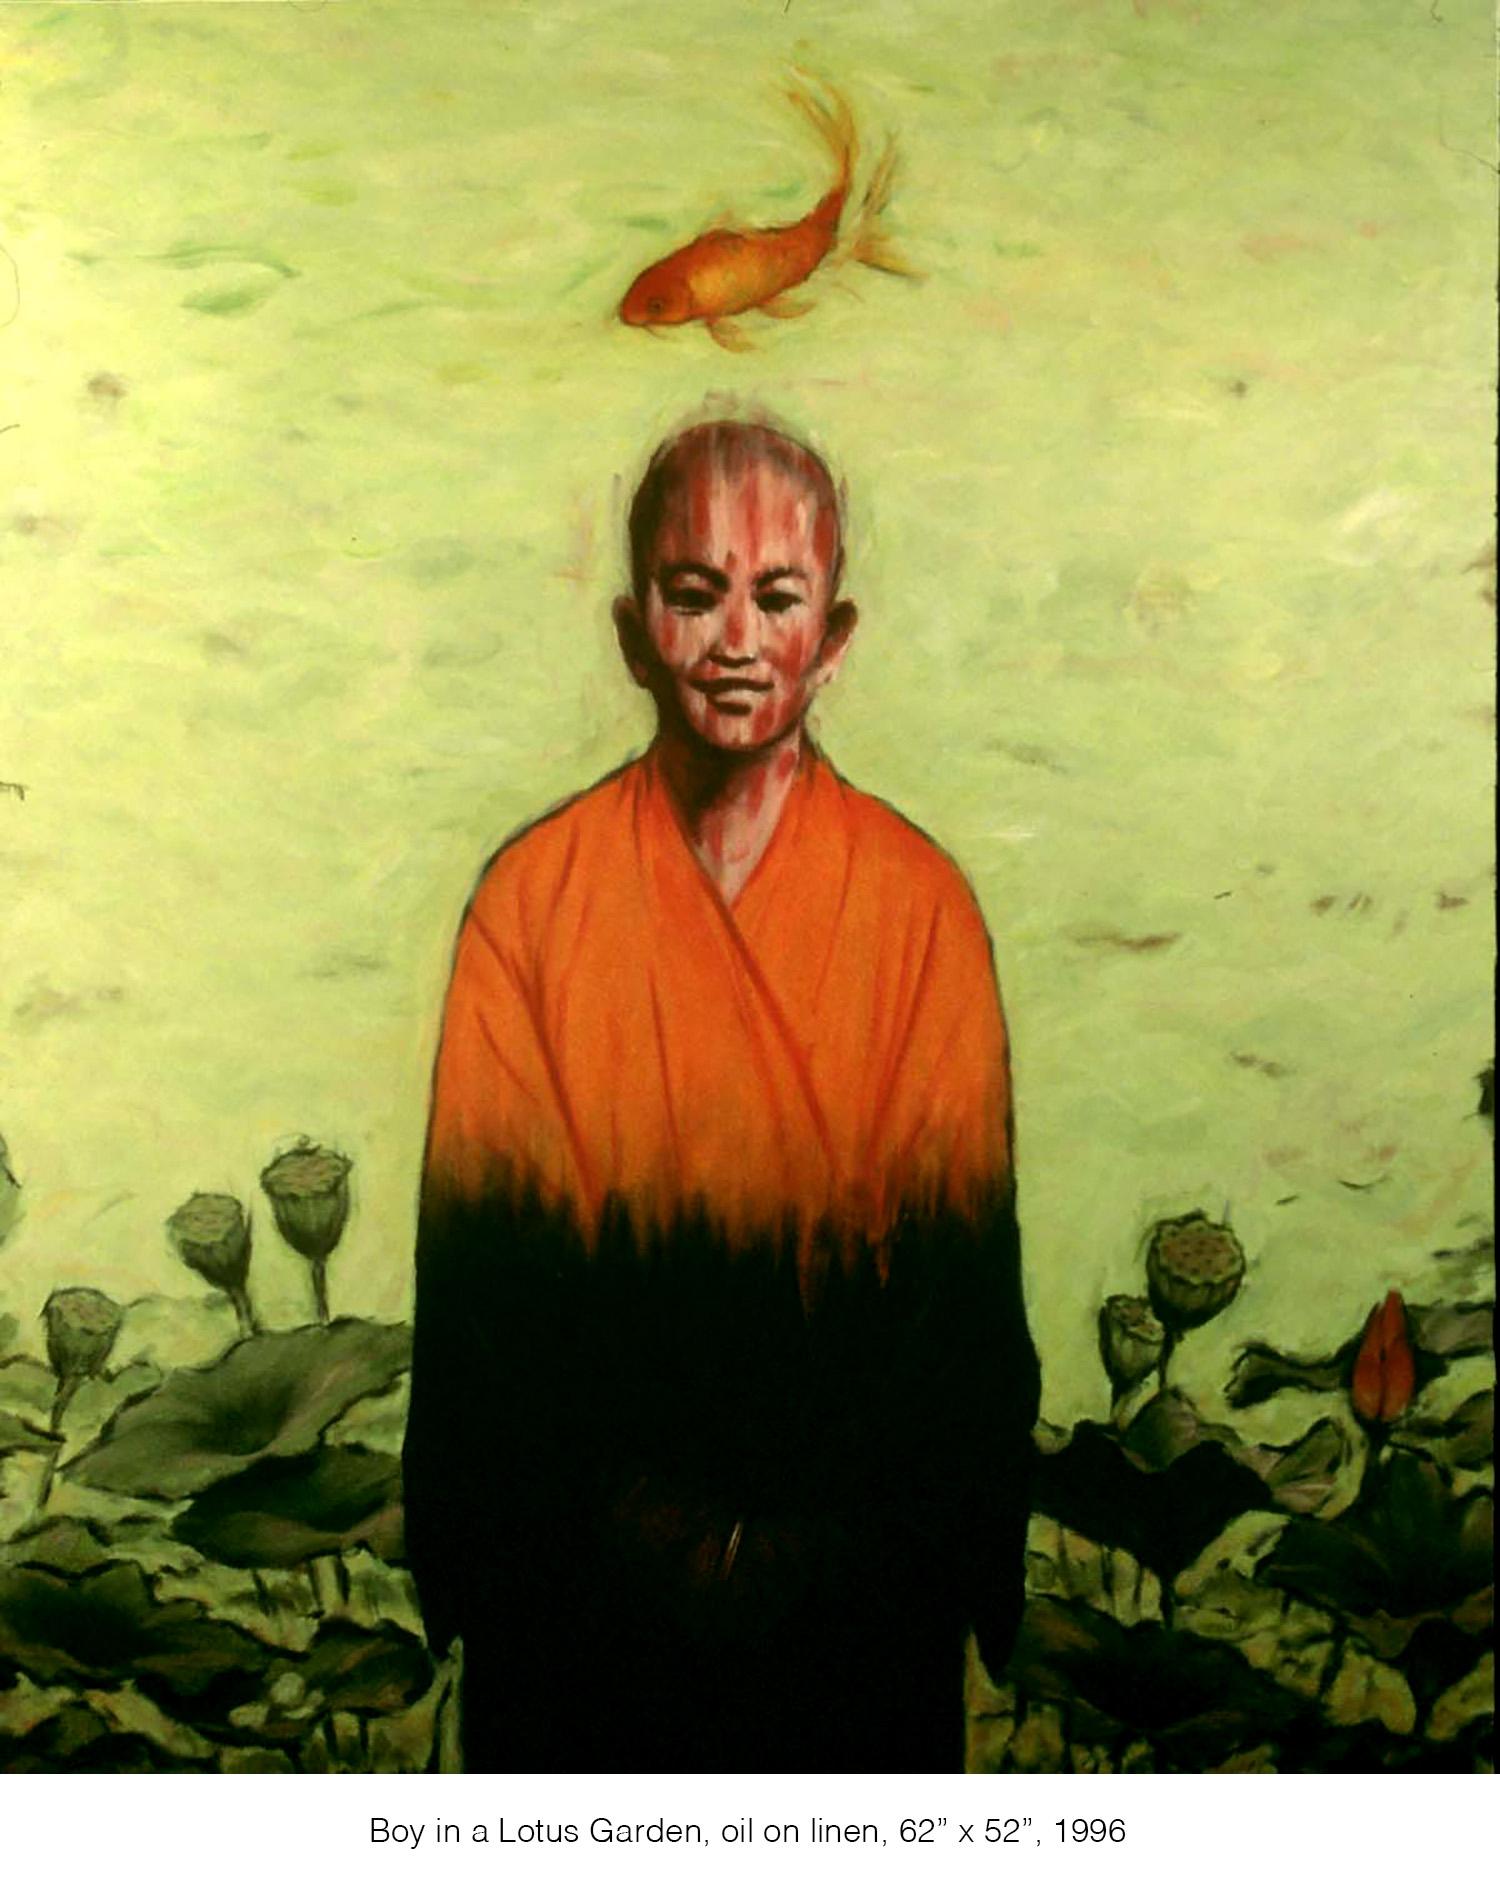 Boy in a Lotus Garden_1500.jpg